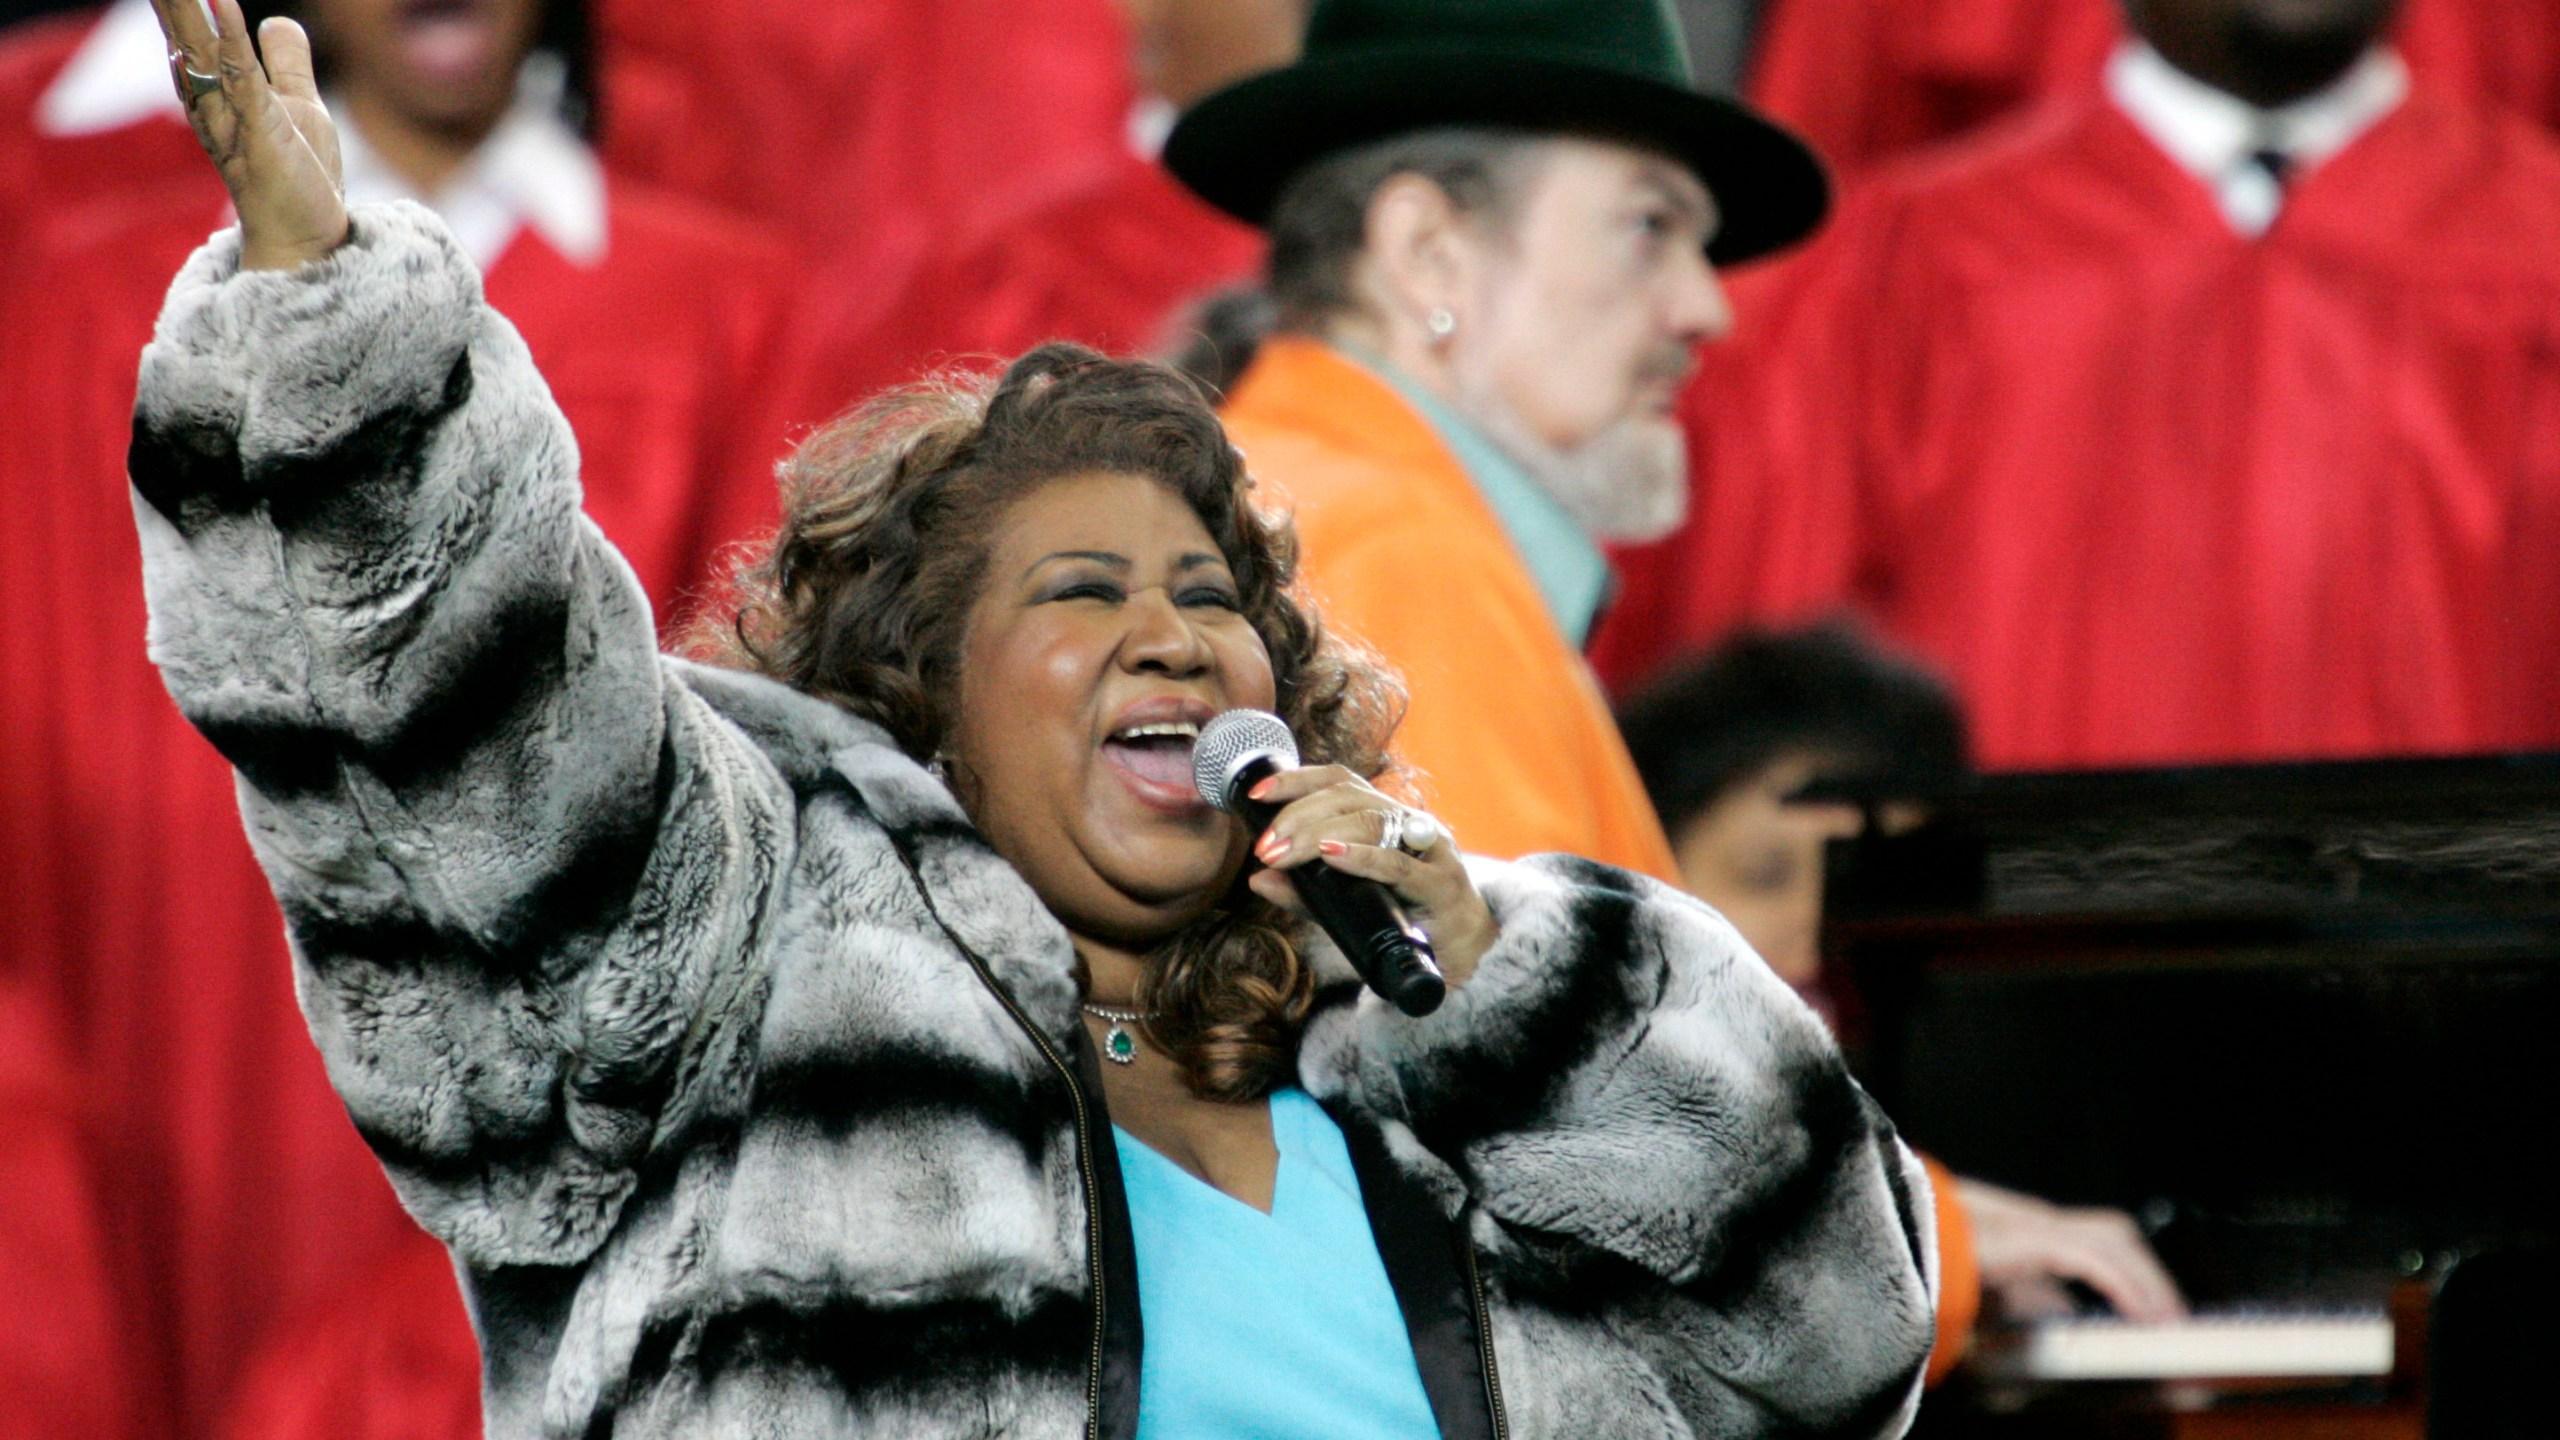 Aretha Franklin, FORD FIELD SEATTLE SEAHAWKS PITTSBURGH STEELERS FRANKLIN